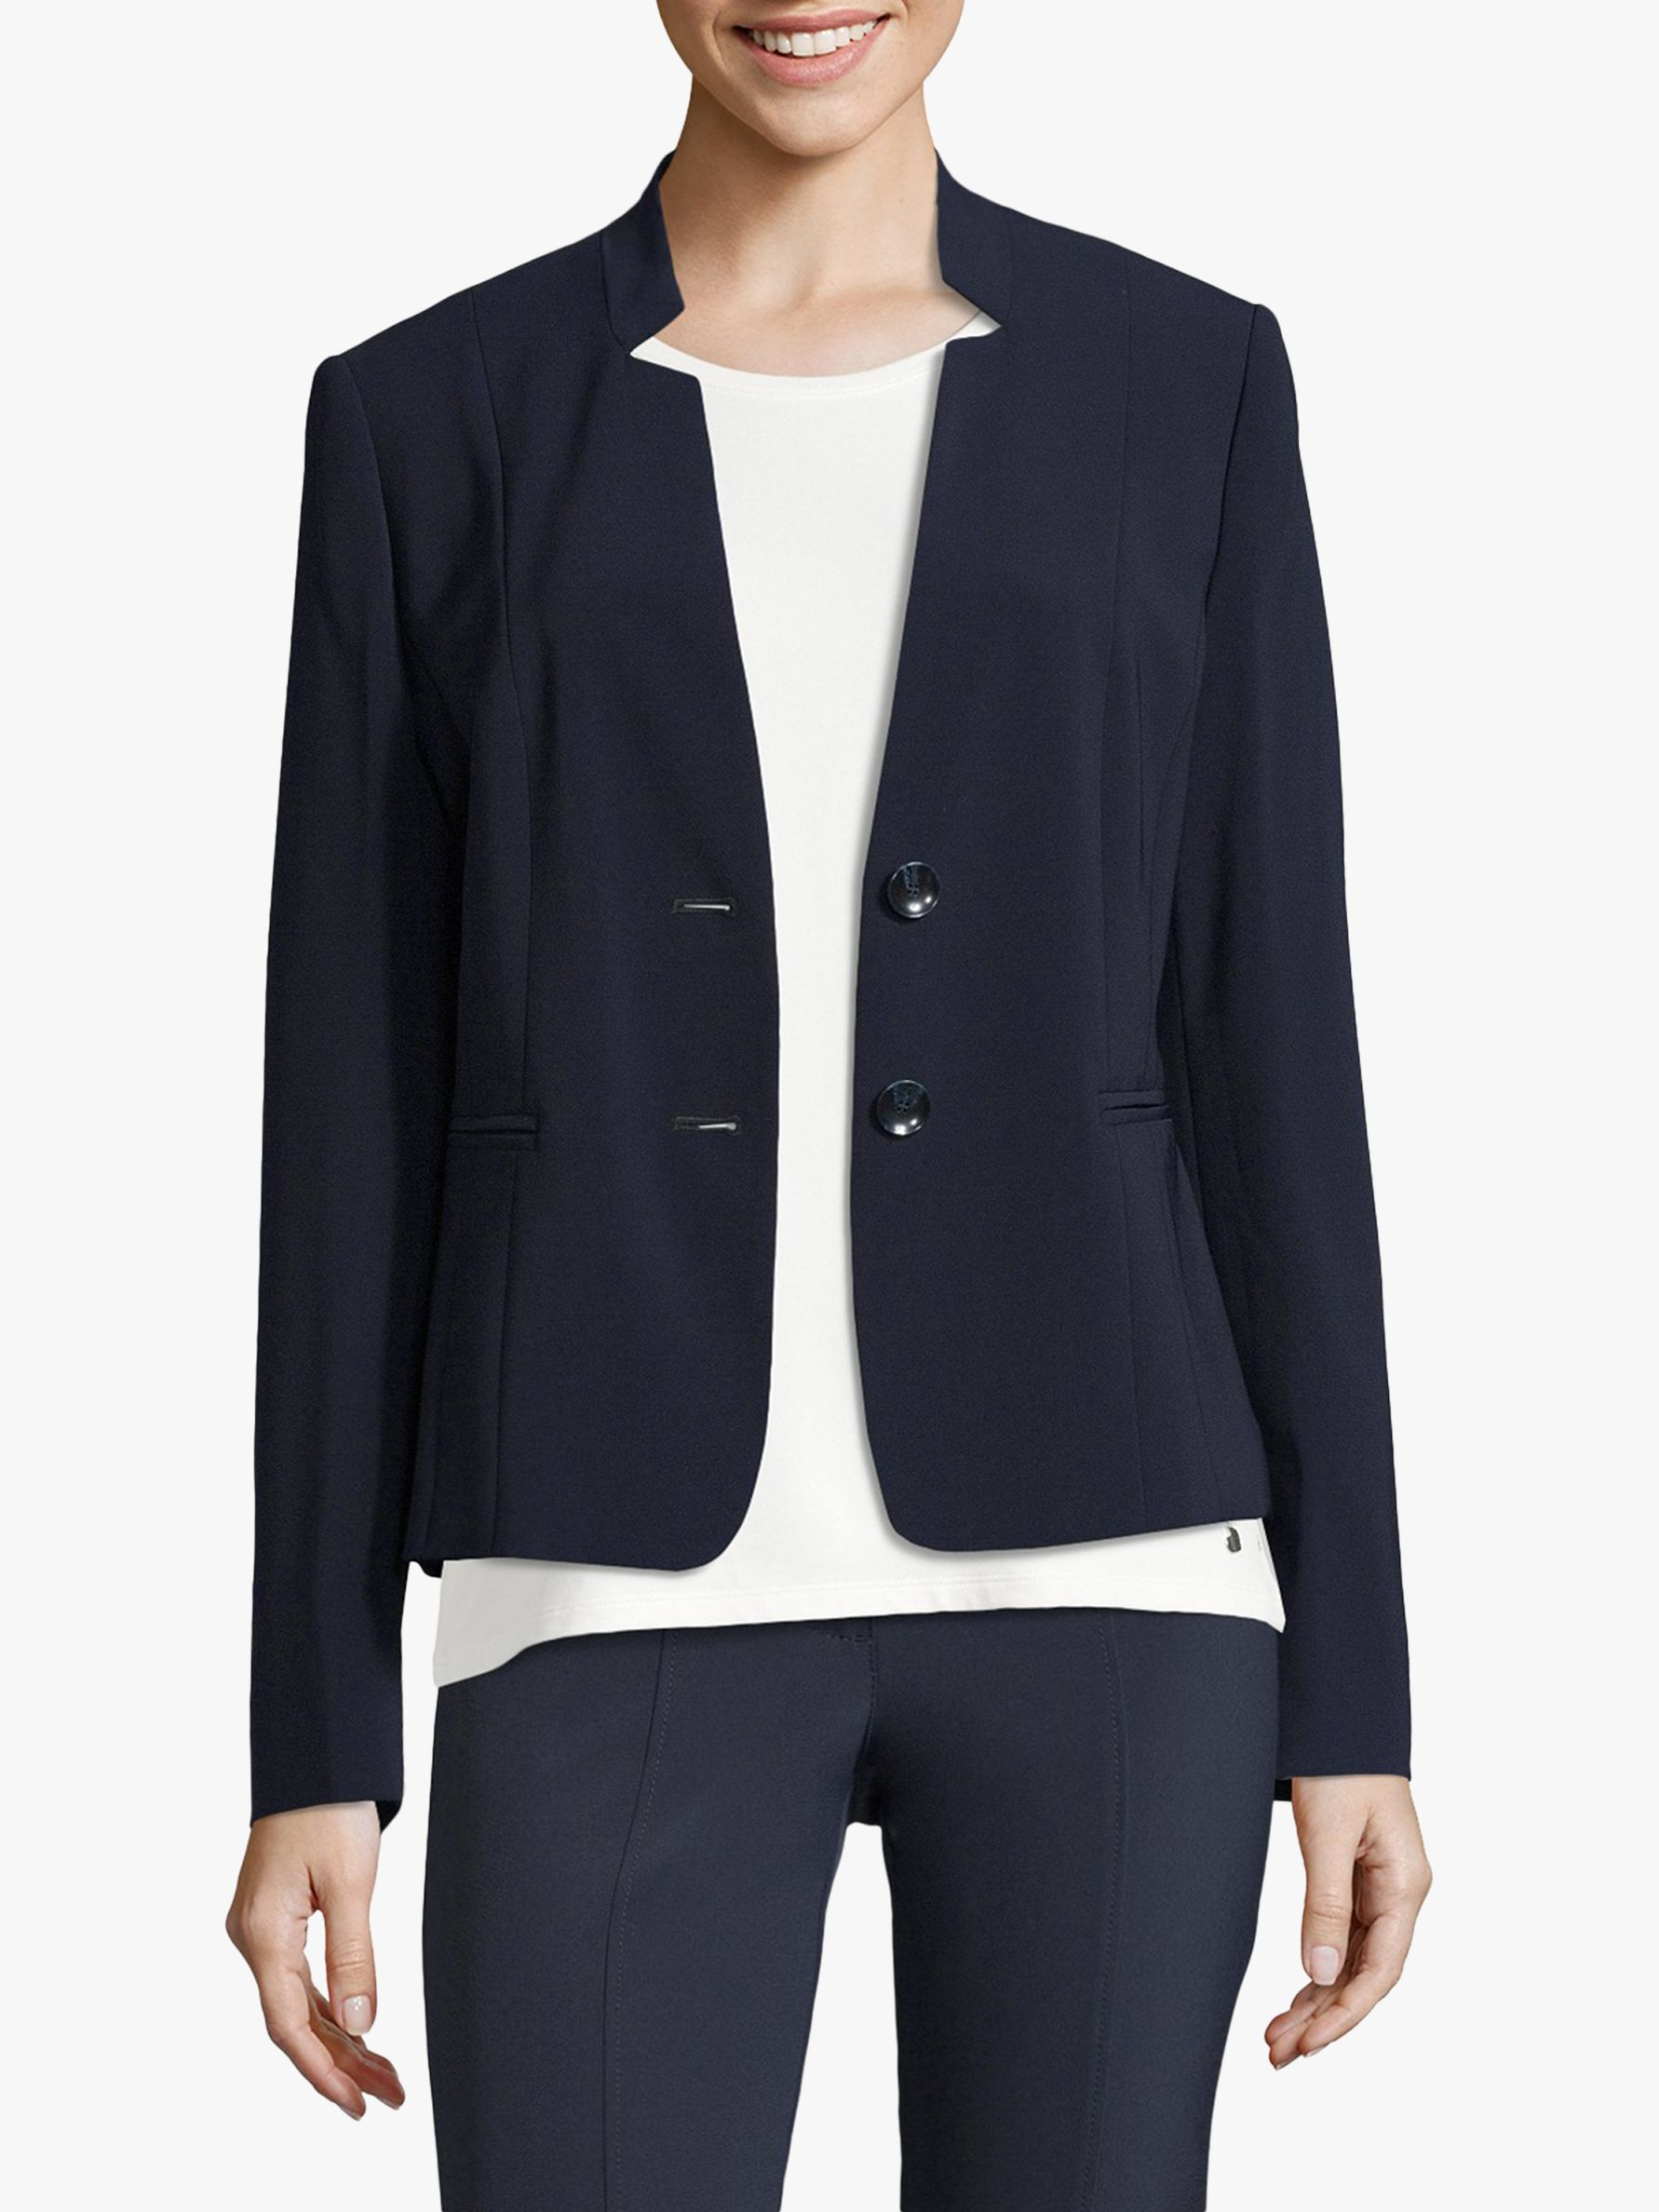 Betty Barclay Betty Barclay Tailored Crepe Jacket